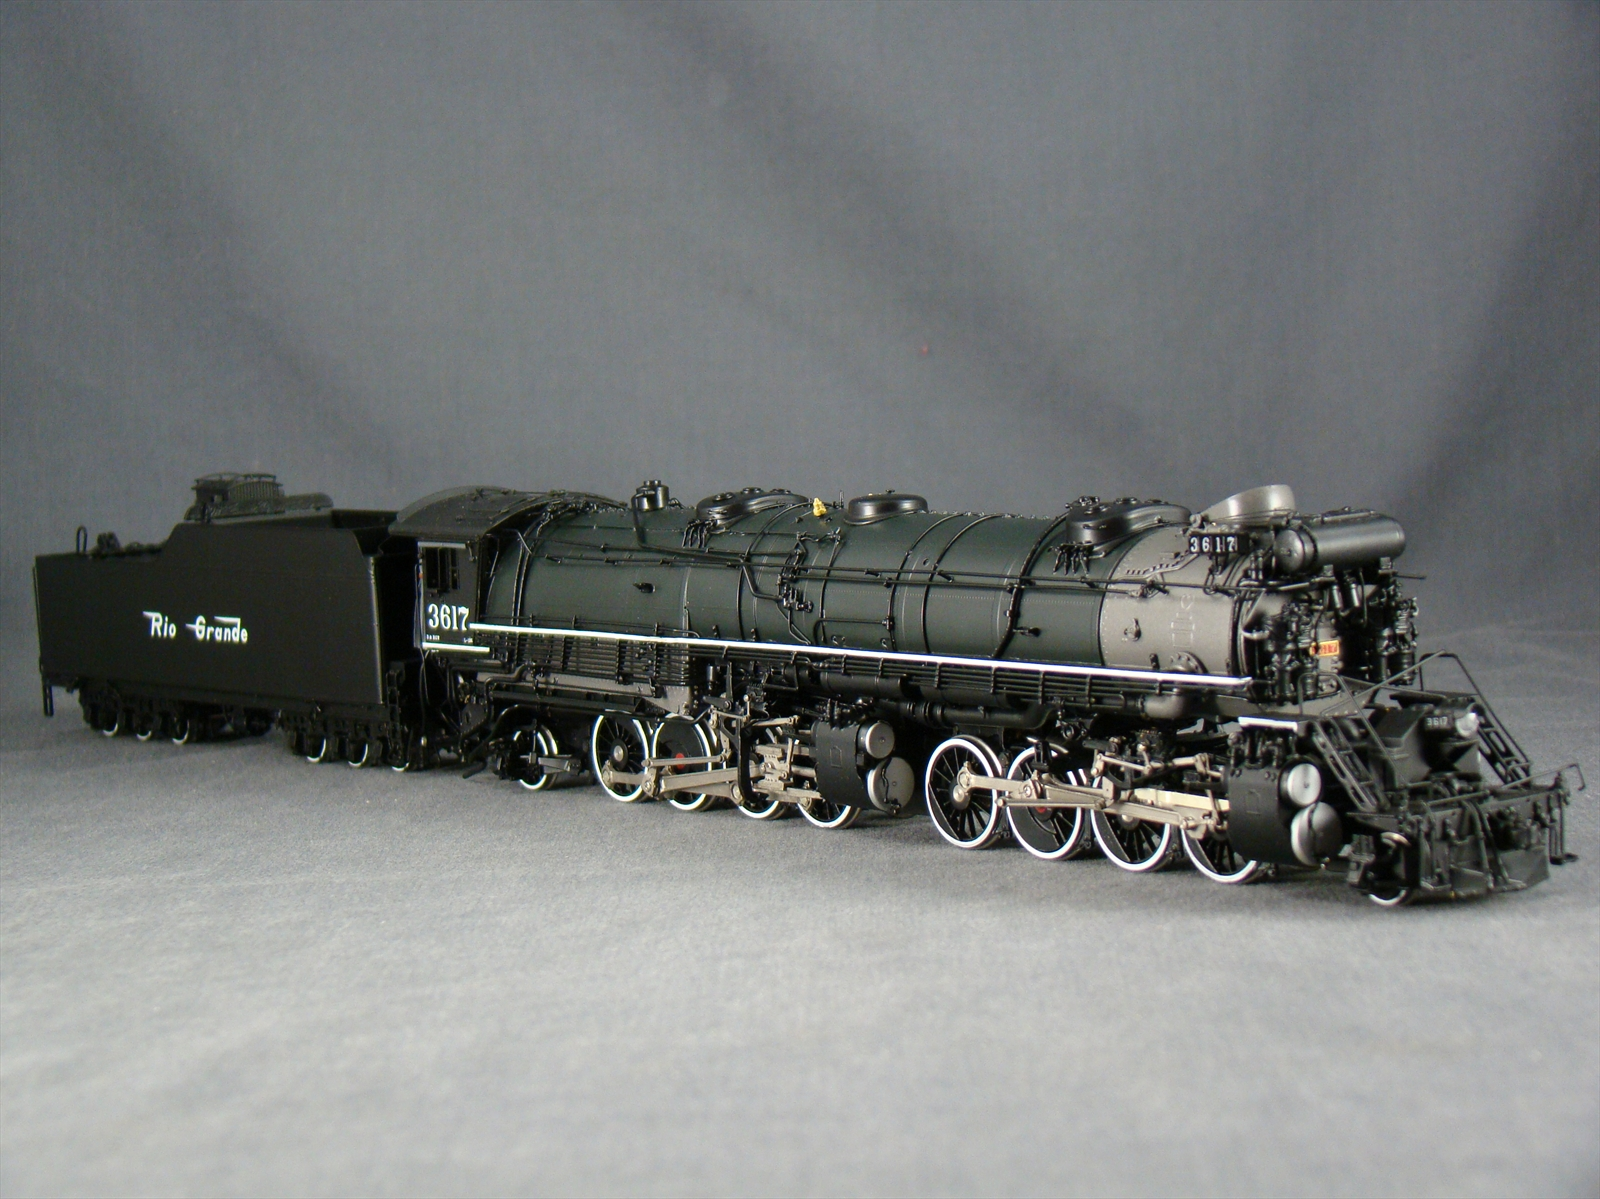 W&R - L-132, 2-8-8-2, D&RGW, Version 2, green boiler, No.3617 (Samhongsa).01